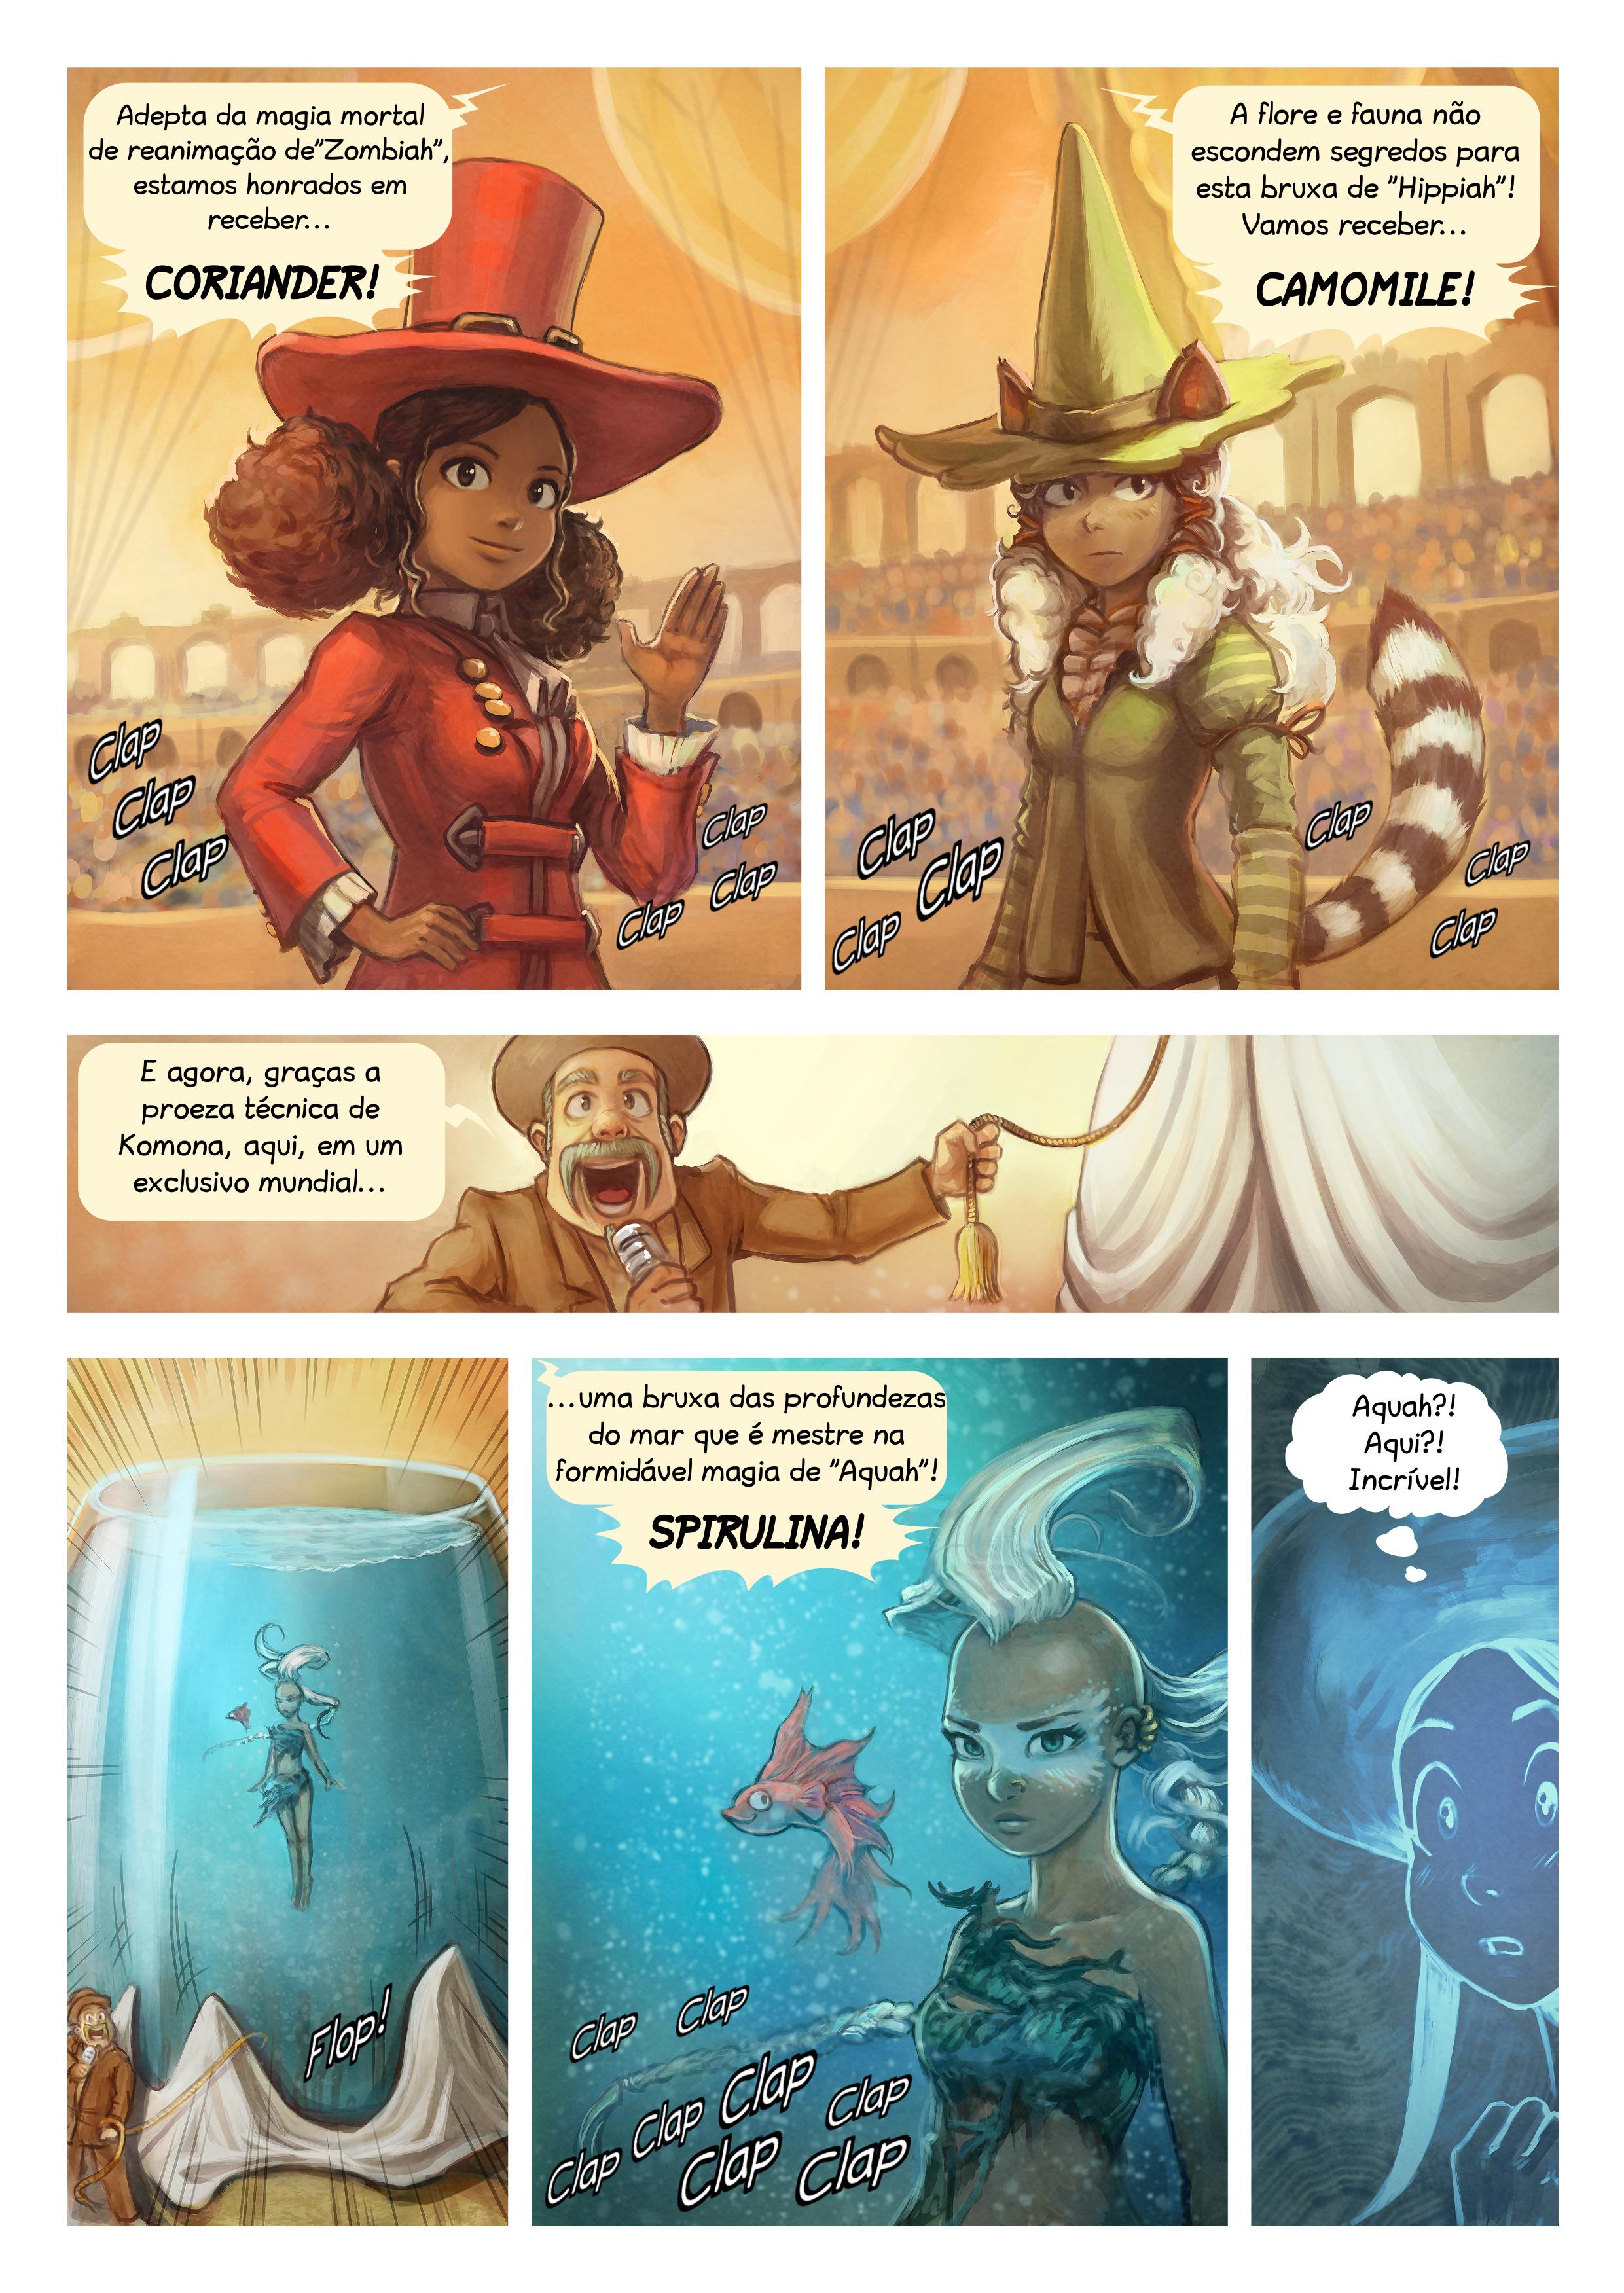 A webcomic page of Pepper&Carrot, episódio 21 [pt], página 4